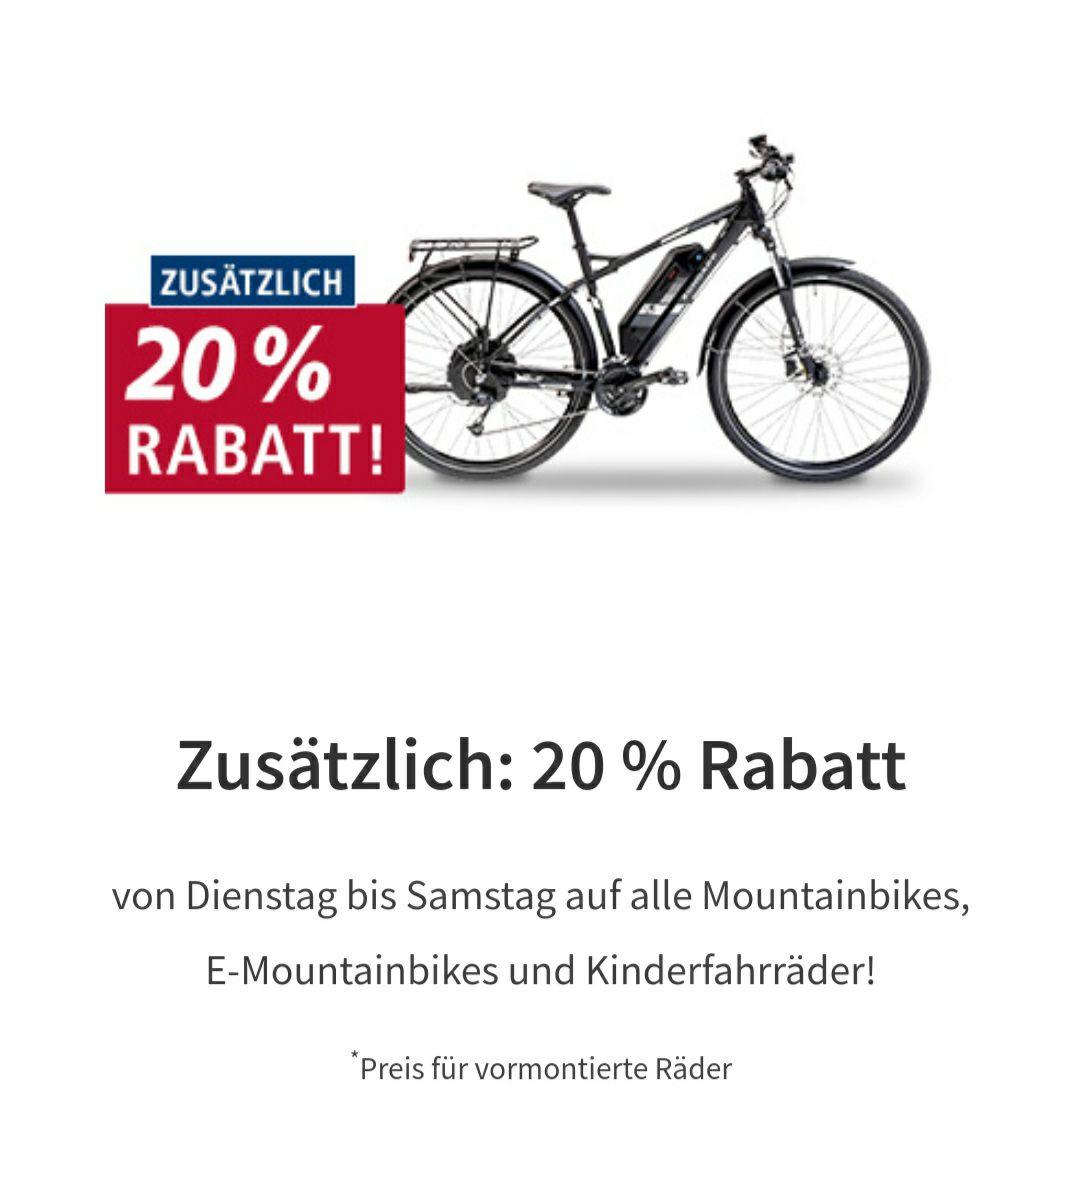 [Real Märkte Bundesweit] zusätzlich 20% Rabatt auf alle E-Mountainbikes/Mountainbikes & Kinderfahrrader